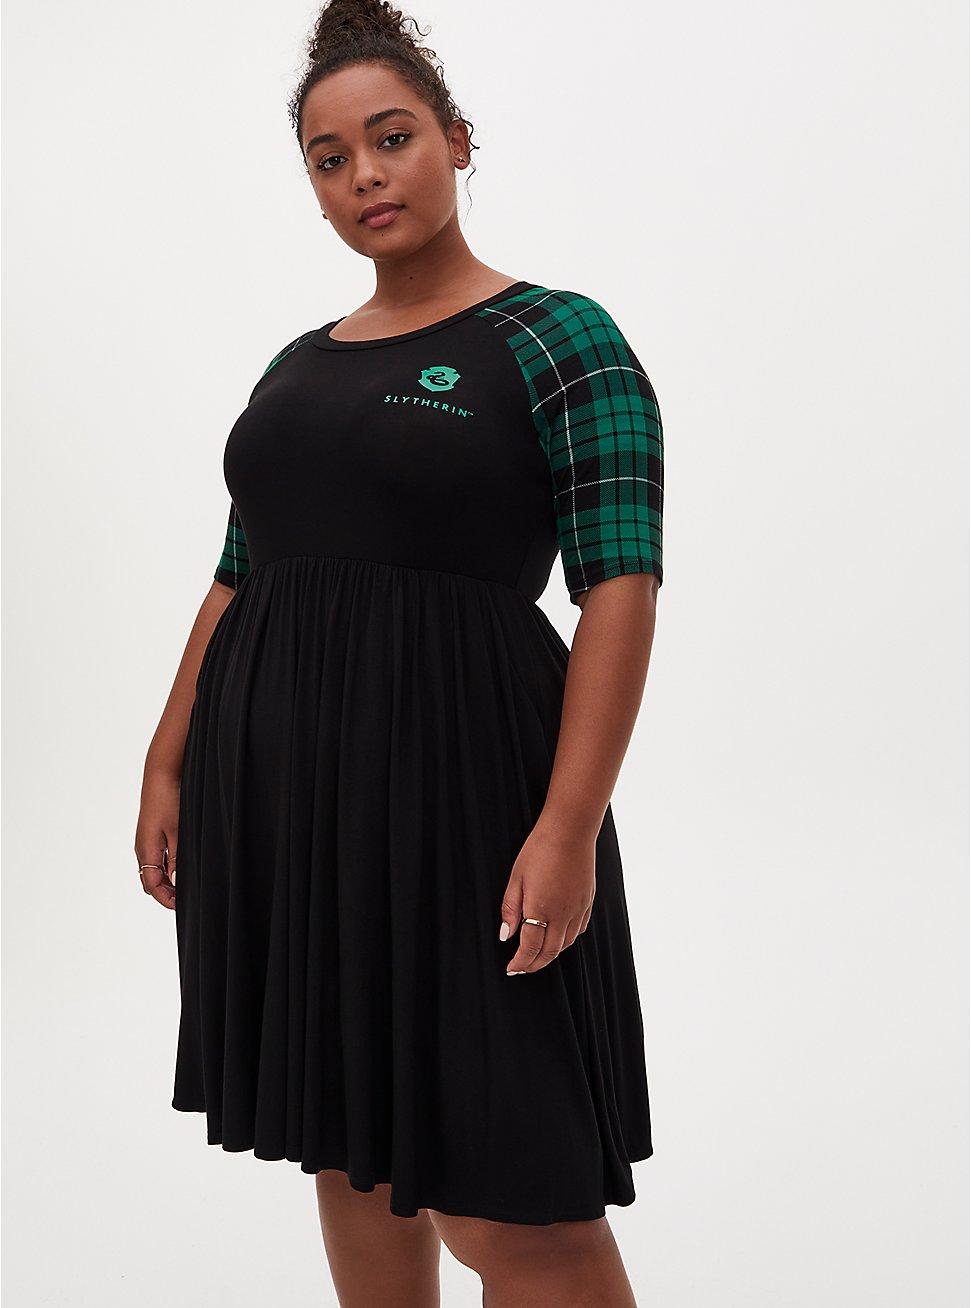 Harry Potter Slytherin House Green Plaid Raglan Mini Skater Dress, BLACK, hi-res